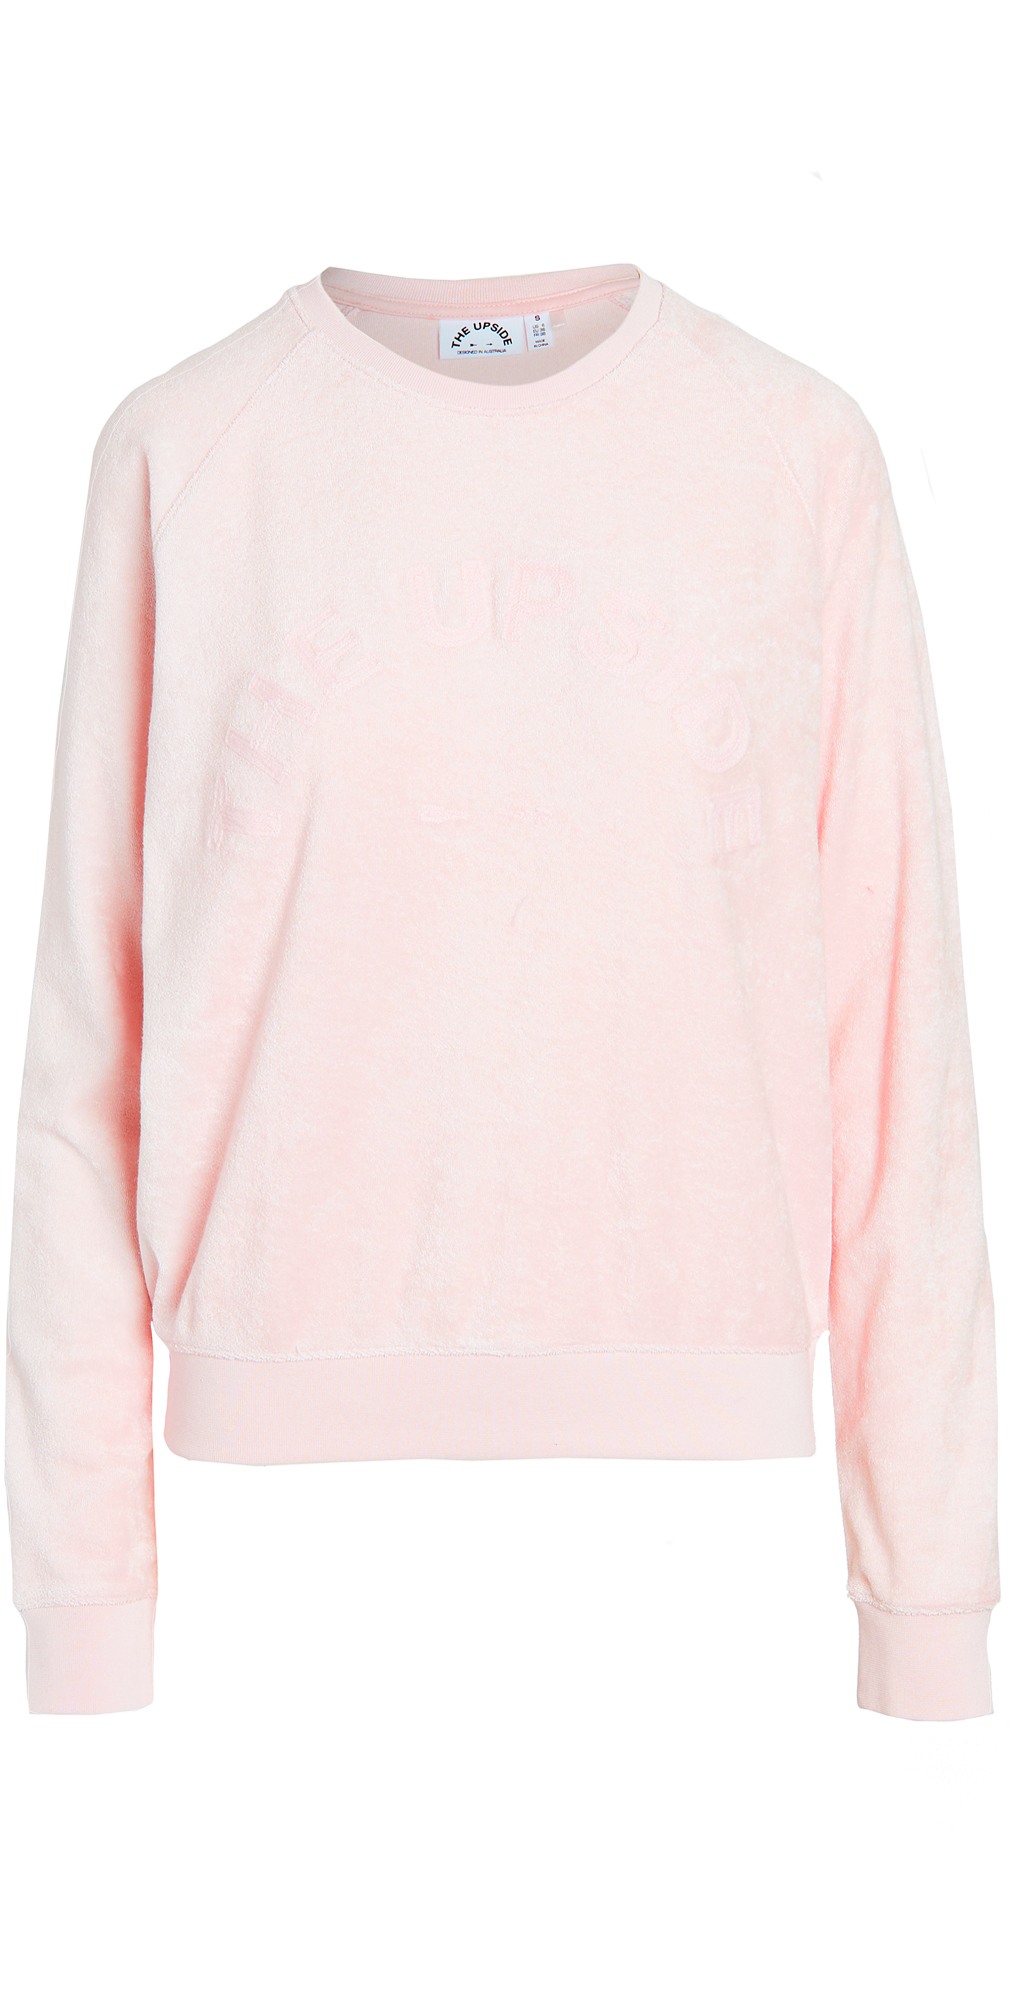 The Upside Florencia Bondi Crew Sweatshirt